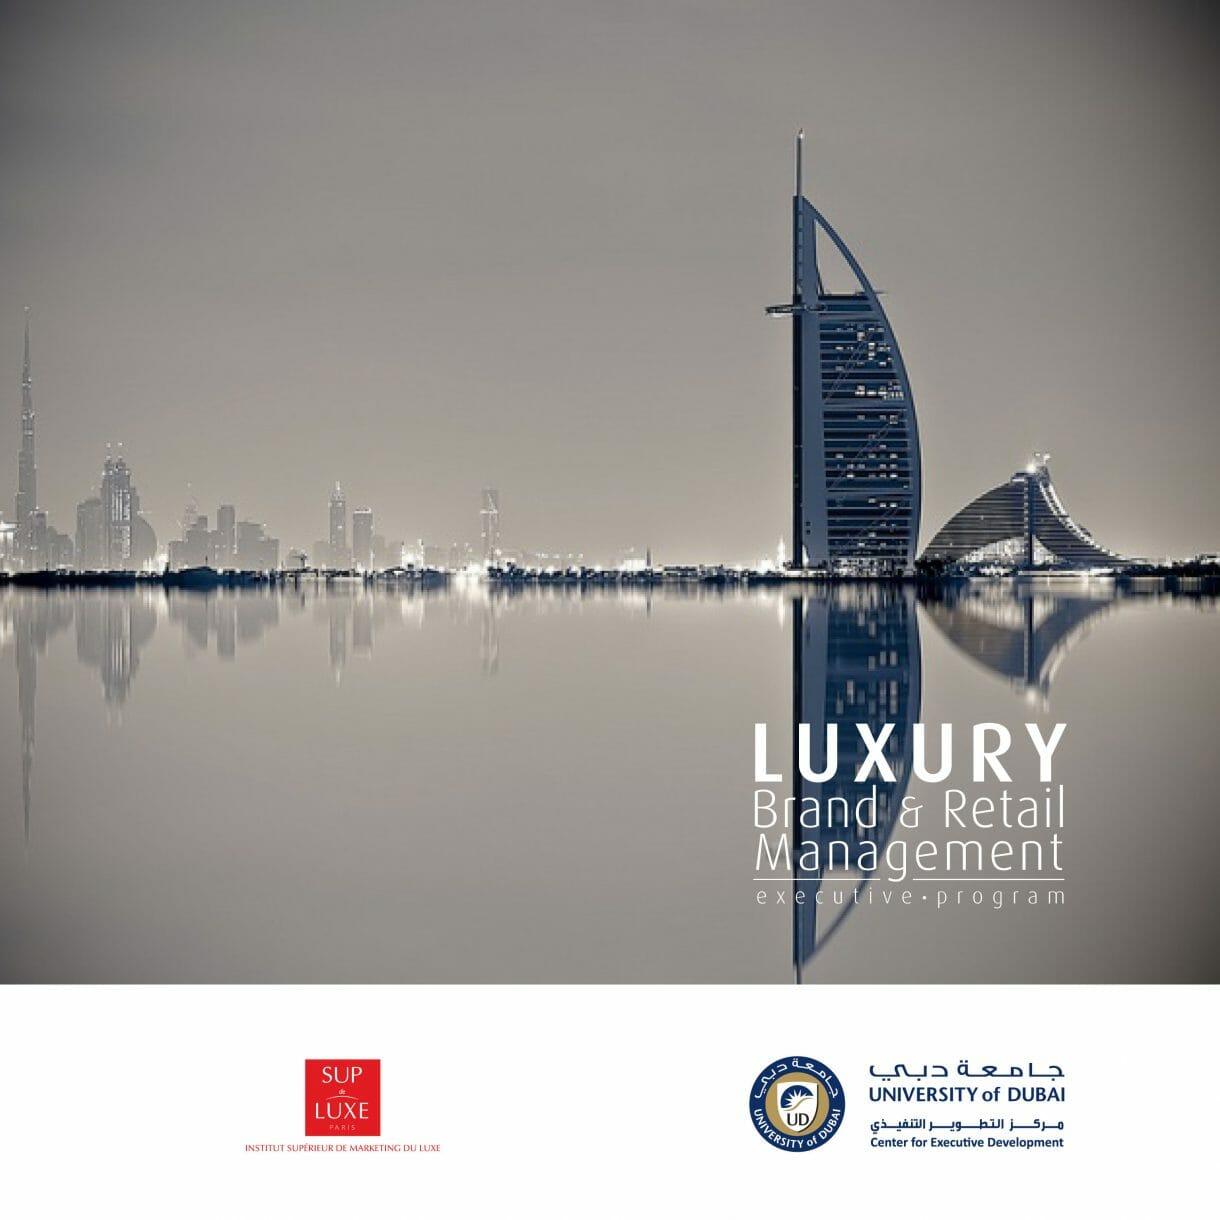 DubaiBrochureSUPsempreco